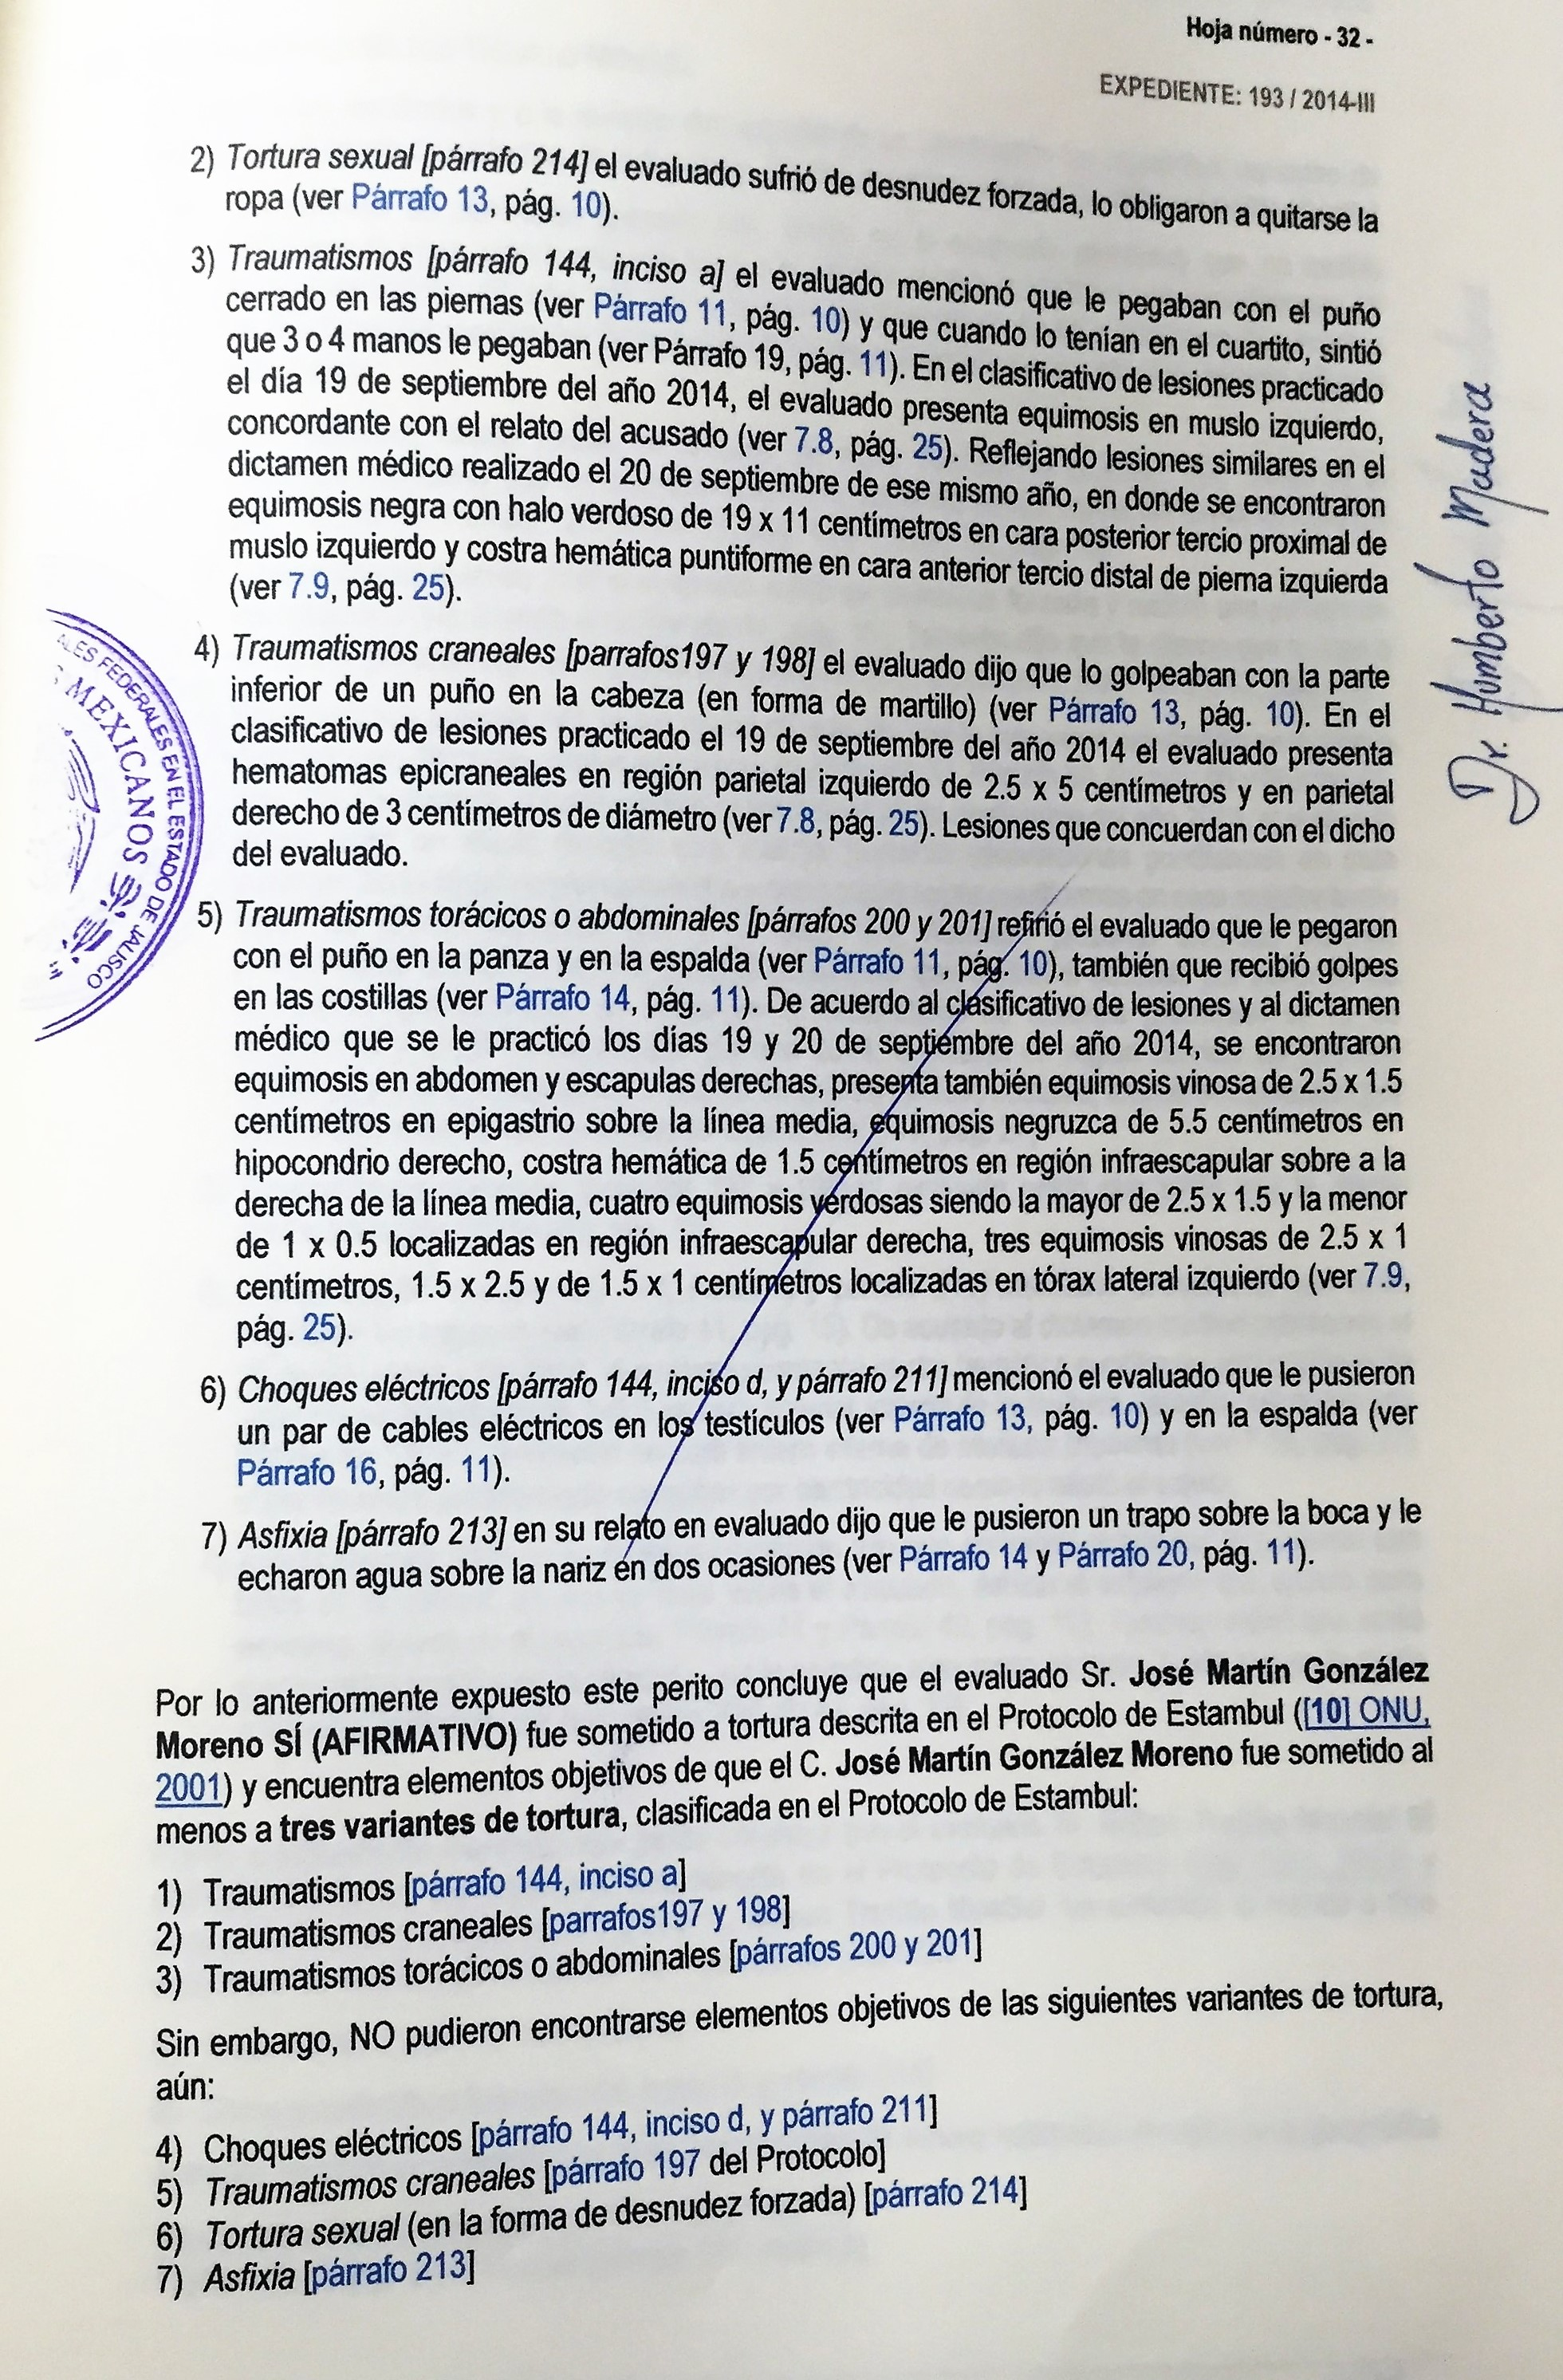 ACDV_EDIT_(ESP)_Articulo_Martin_Gonzalez_-_pic_2